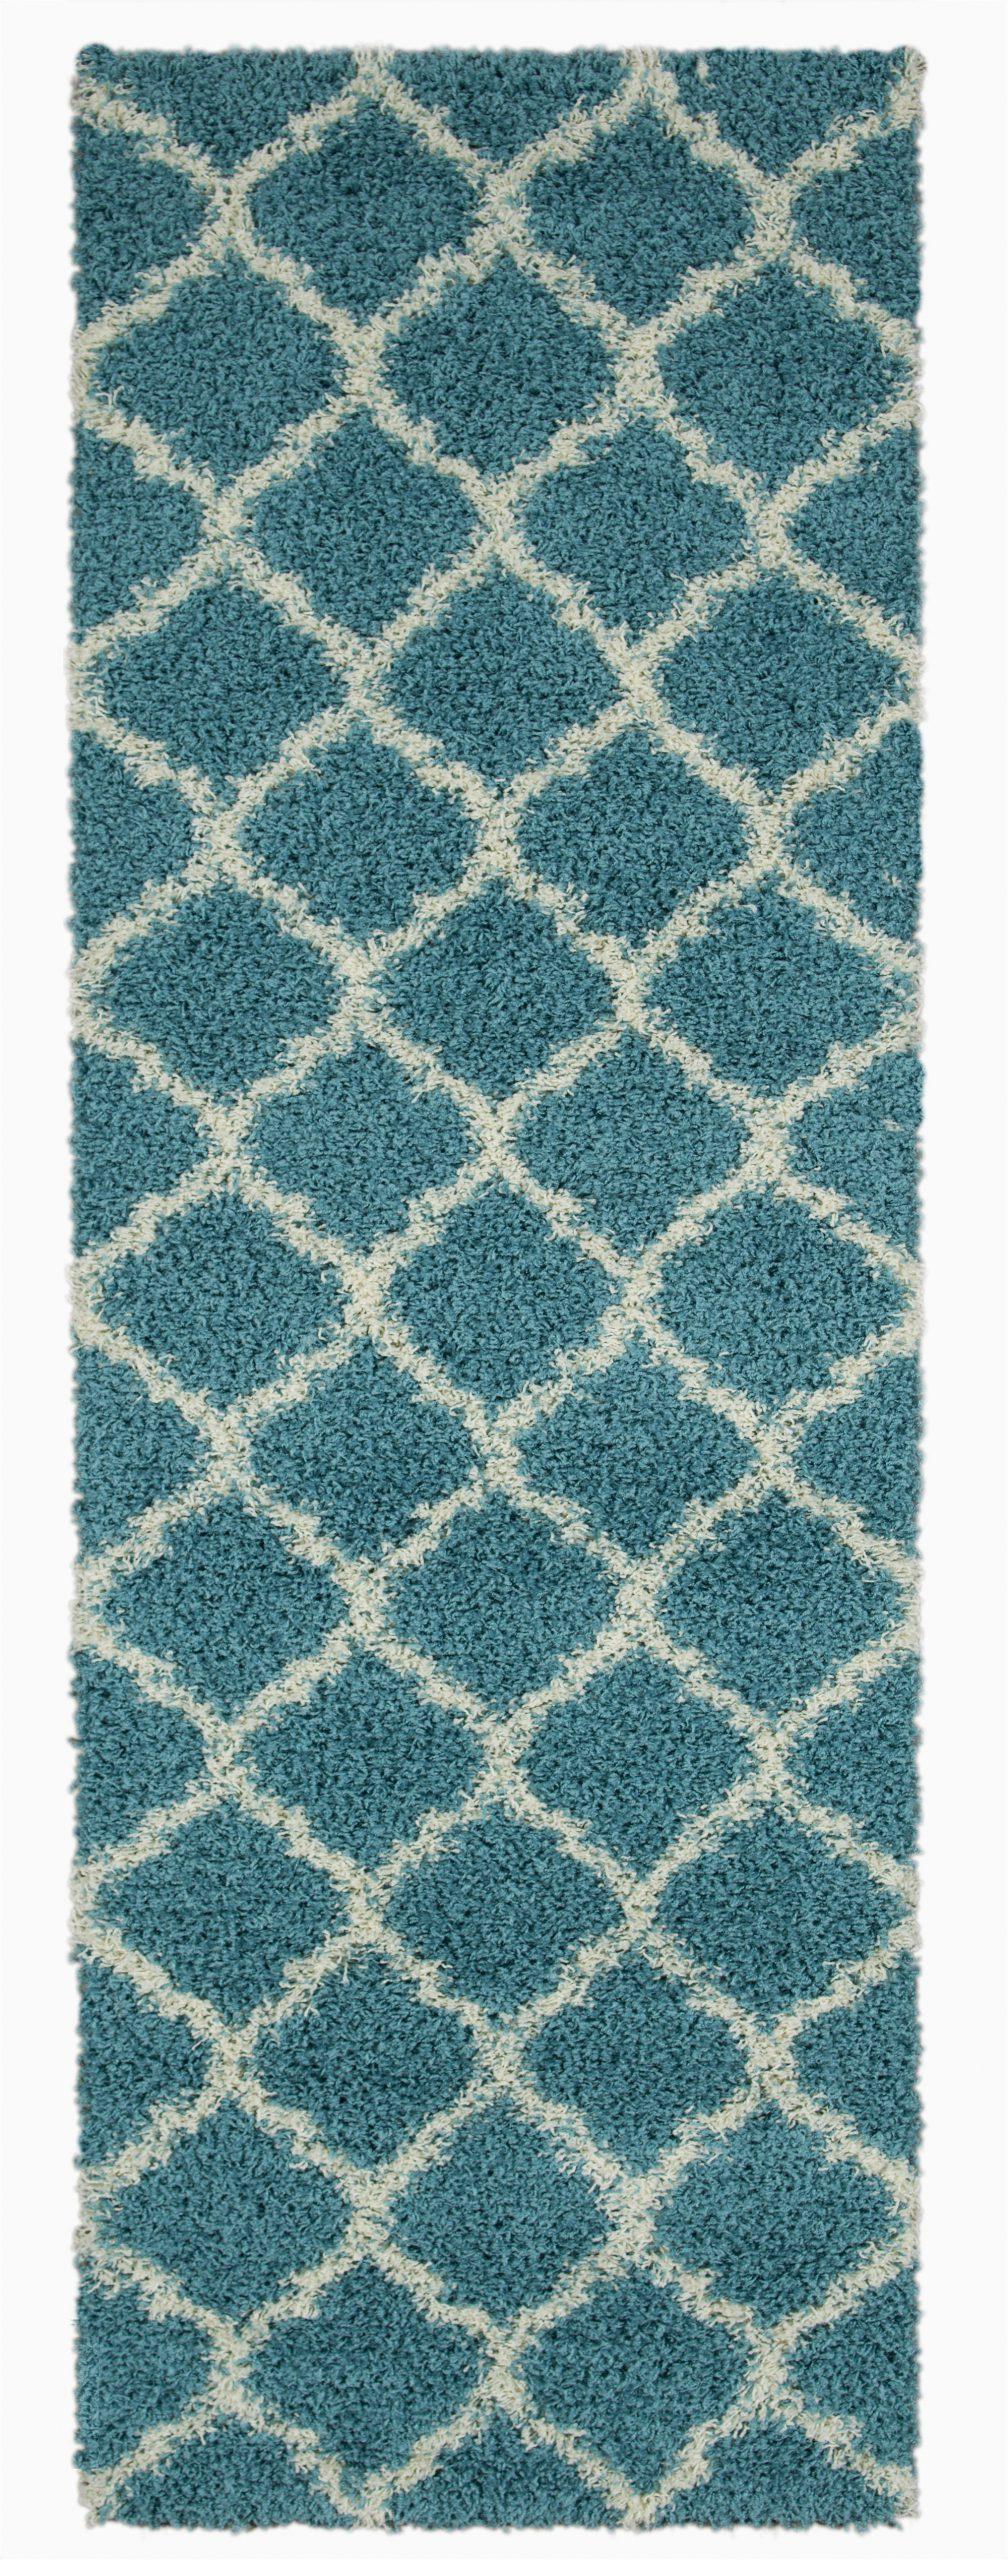 ottomanson ultimate shag collection moroccan trellis design contemporary hallway kitchen shag runner rugs turquiose blue 27x80